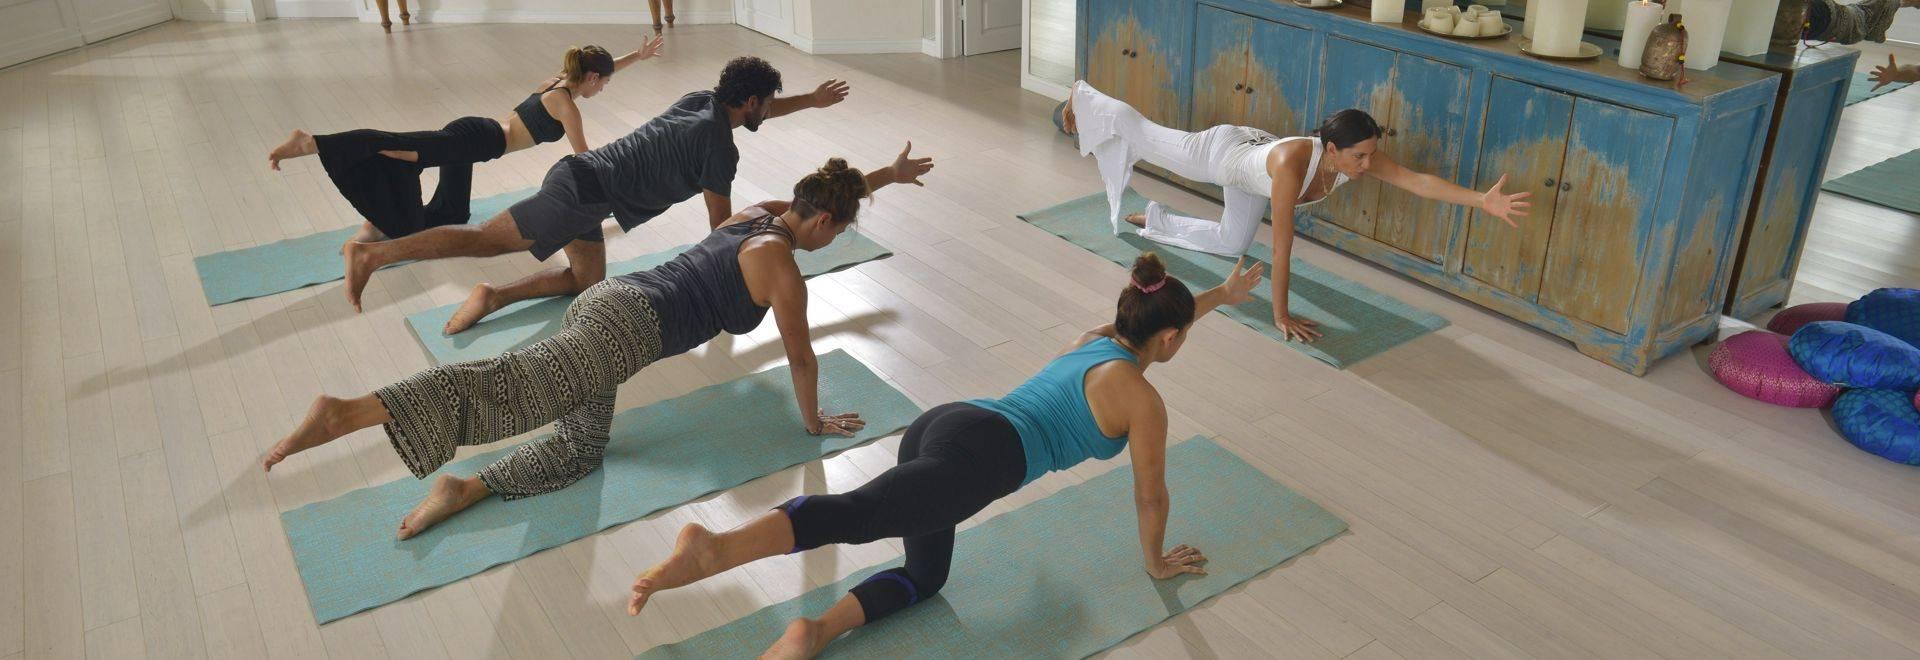 The-Retreat-Costa-Rica-yoga.JPG